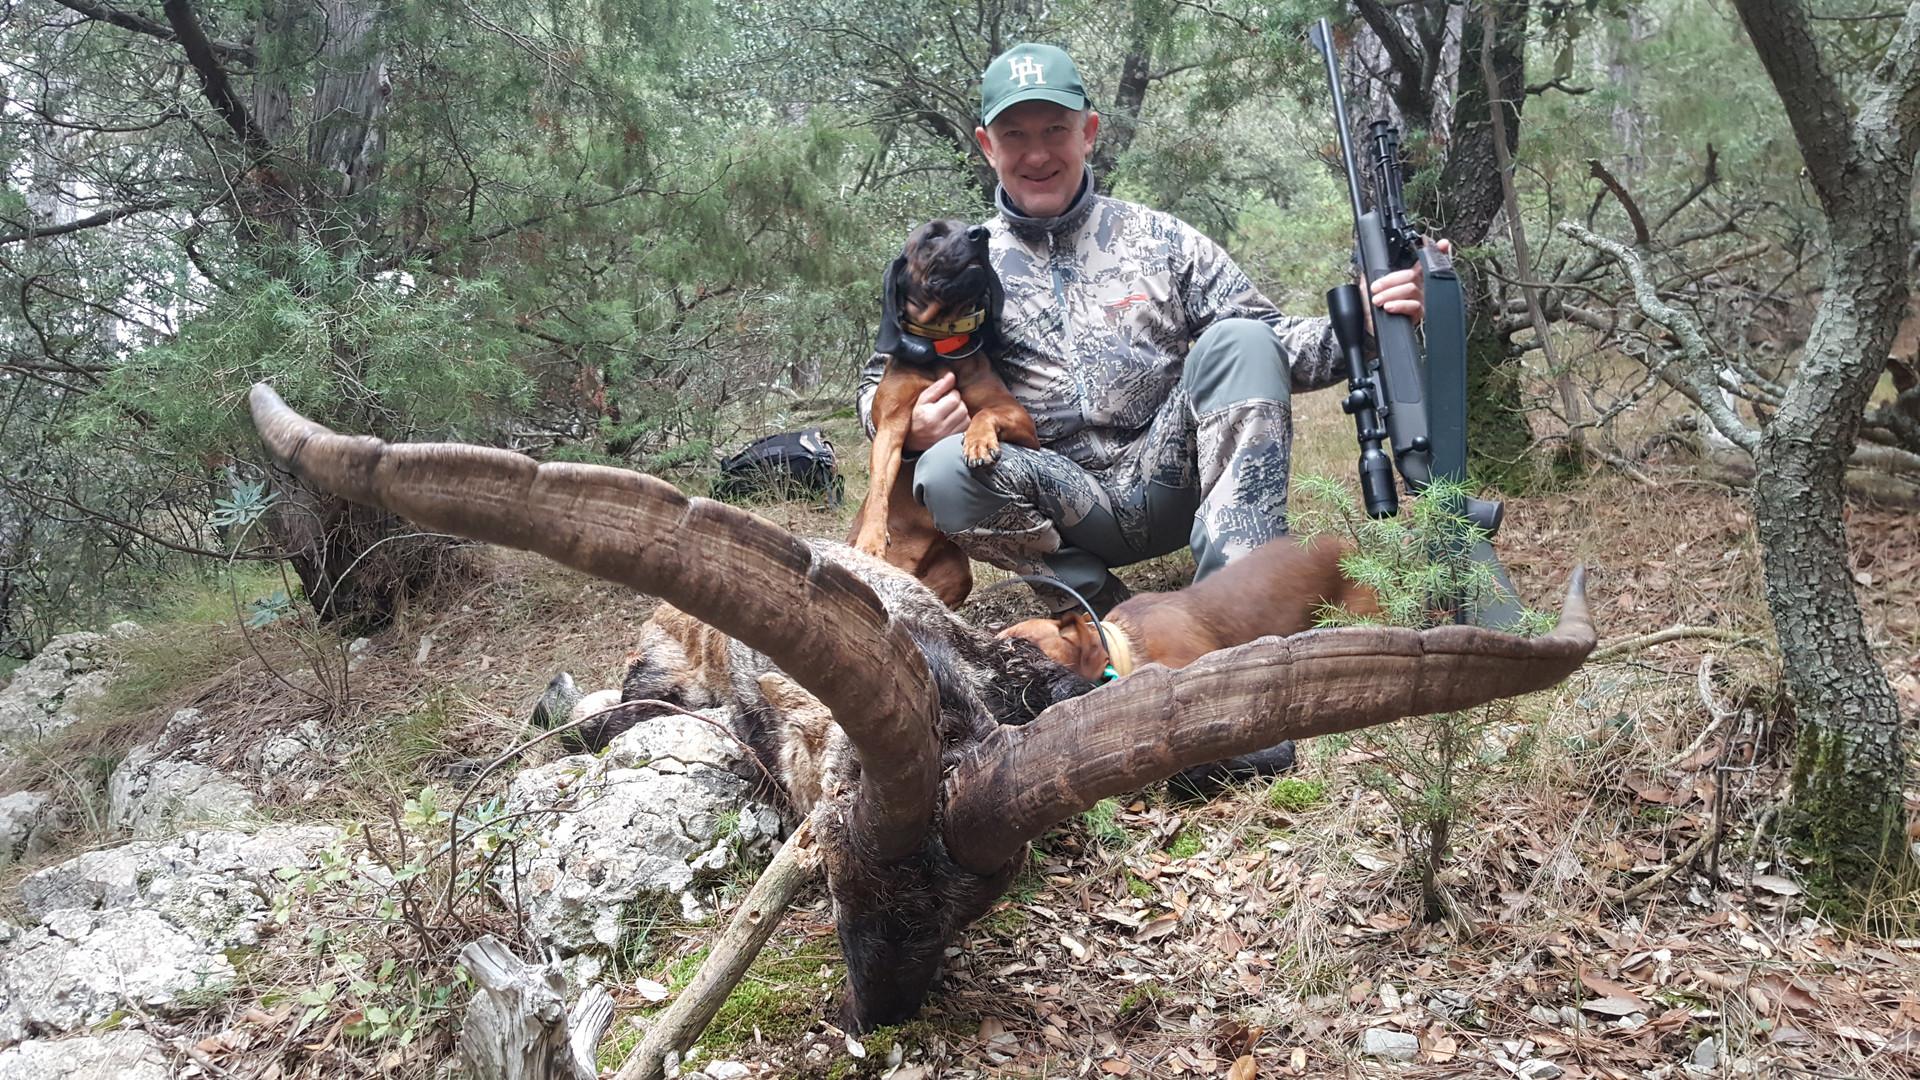 ibex-spain-beceite-hunt-lynx-travel